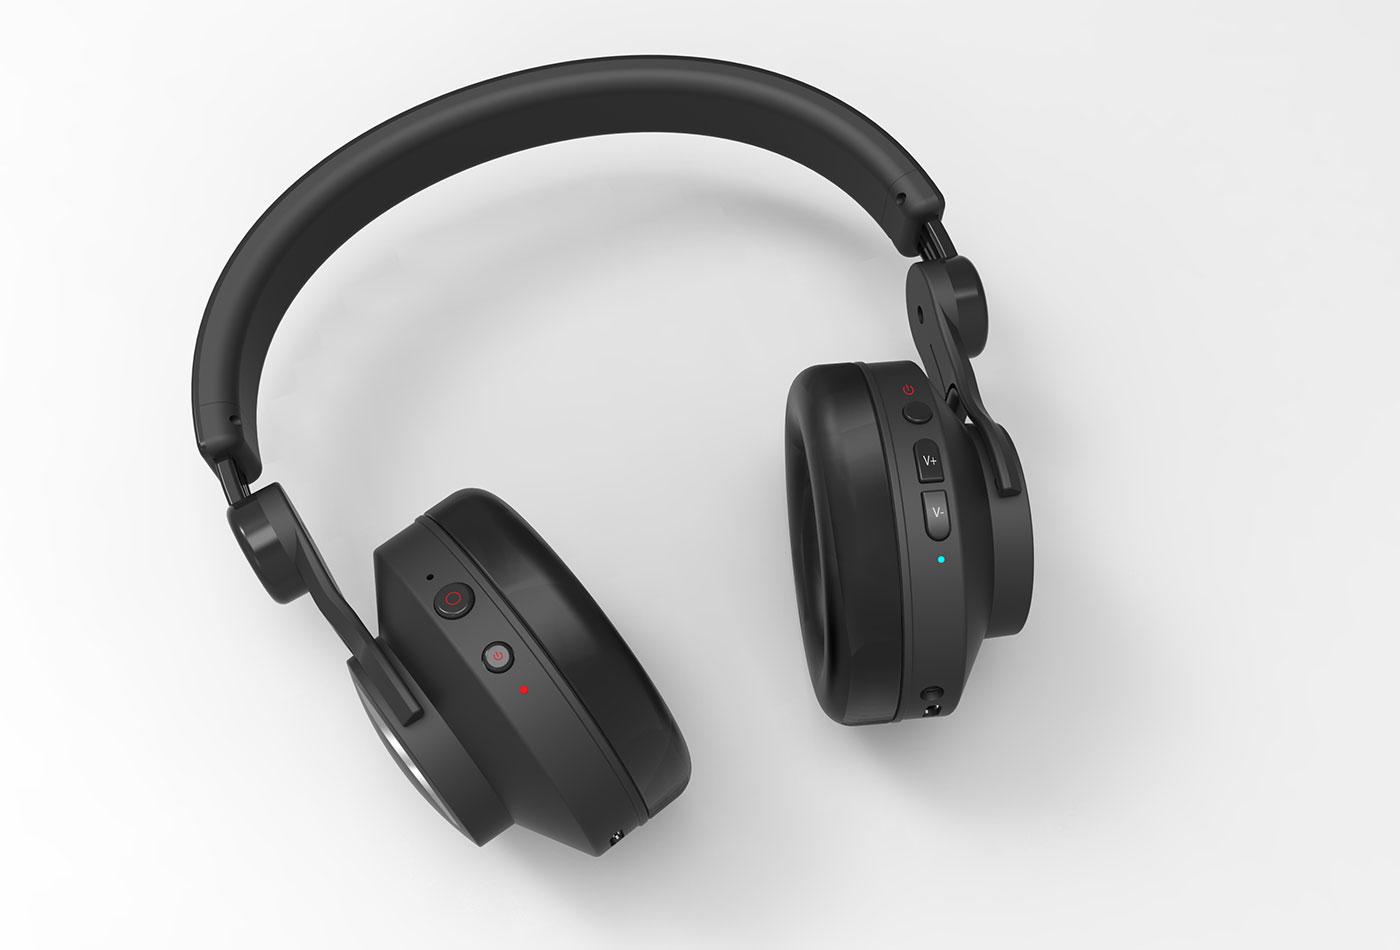 Altec Lansing's DJ headphones pack a camera for livestreaming